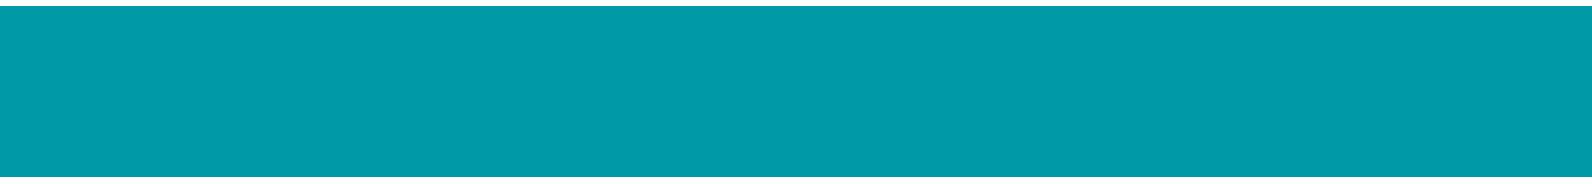 Margaritaville Apparel Logo